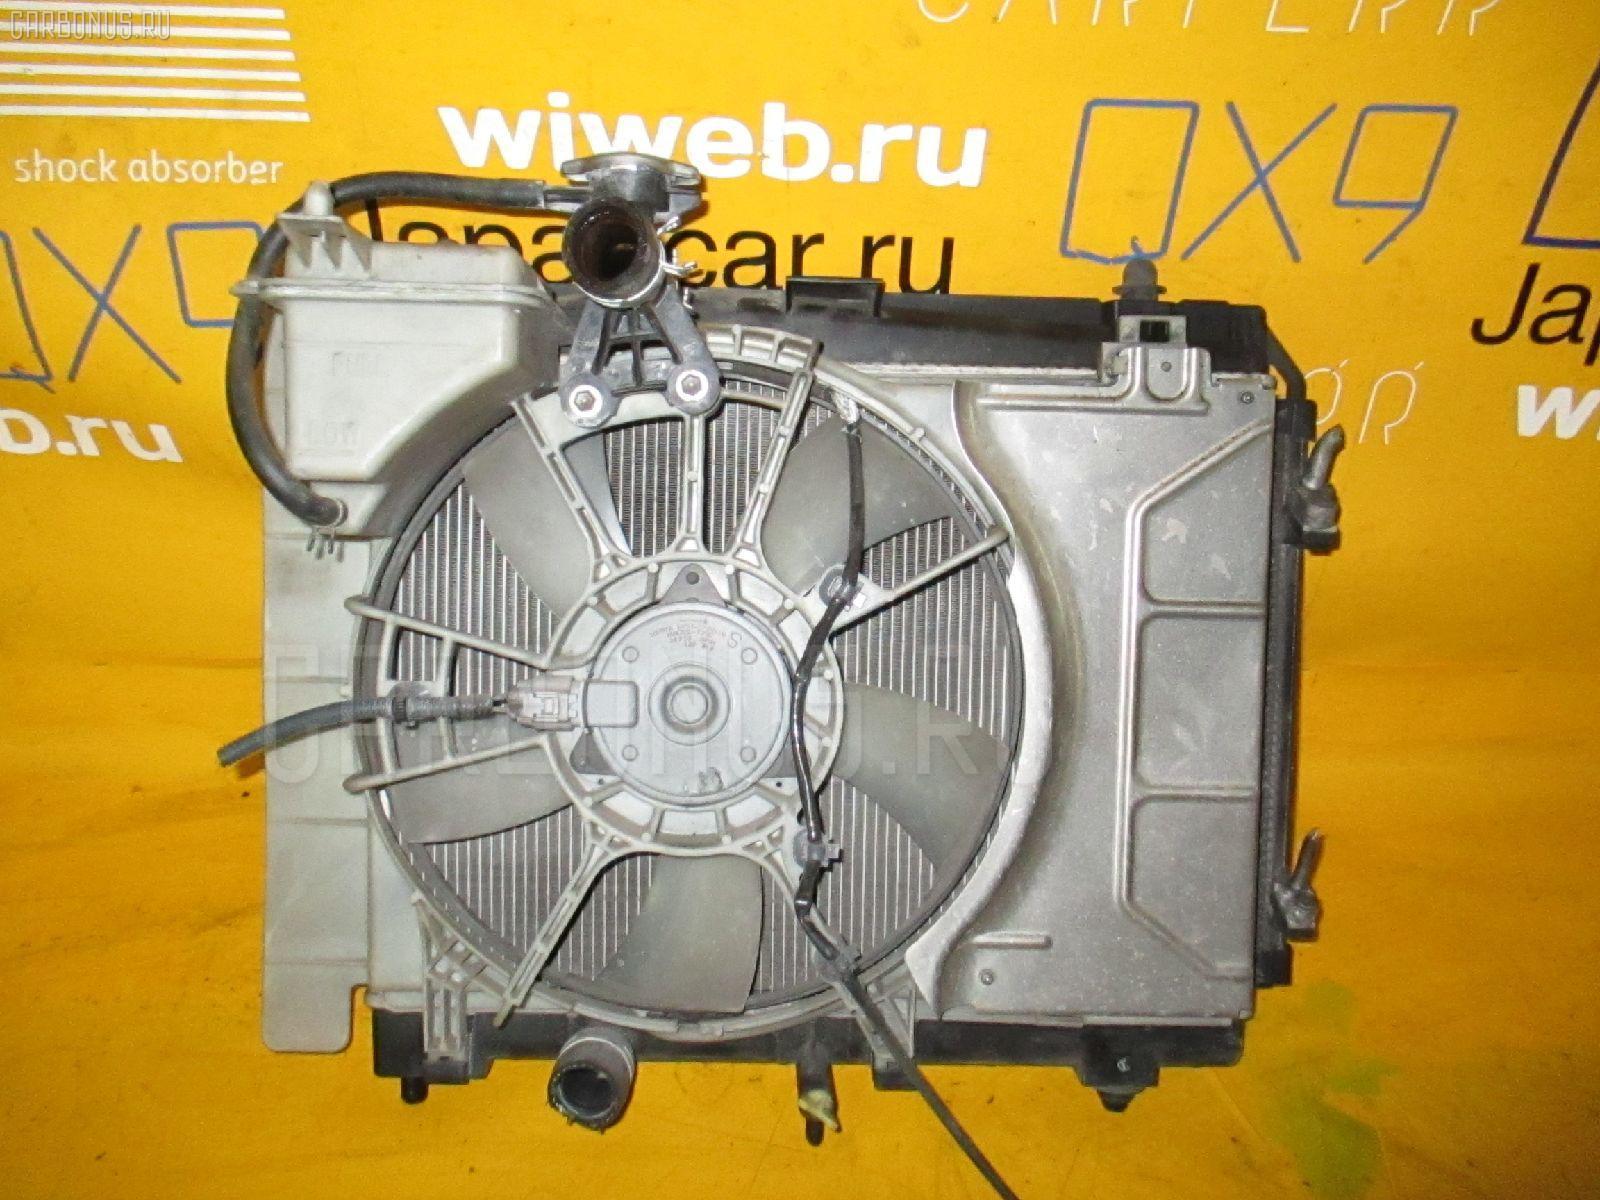 Радиатор ДВС TOYOTA VITZ KSP90 1KR-FE. Фото 7